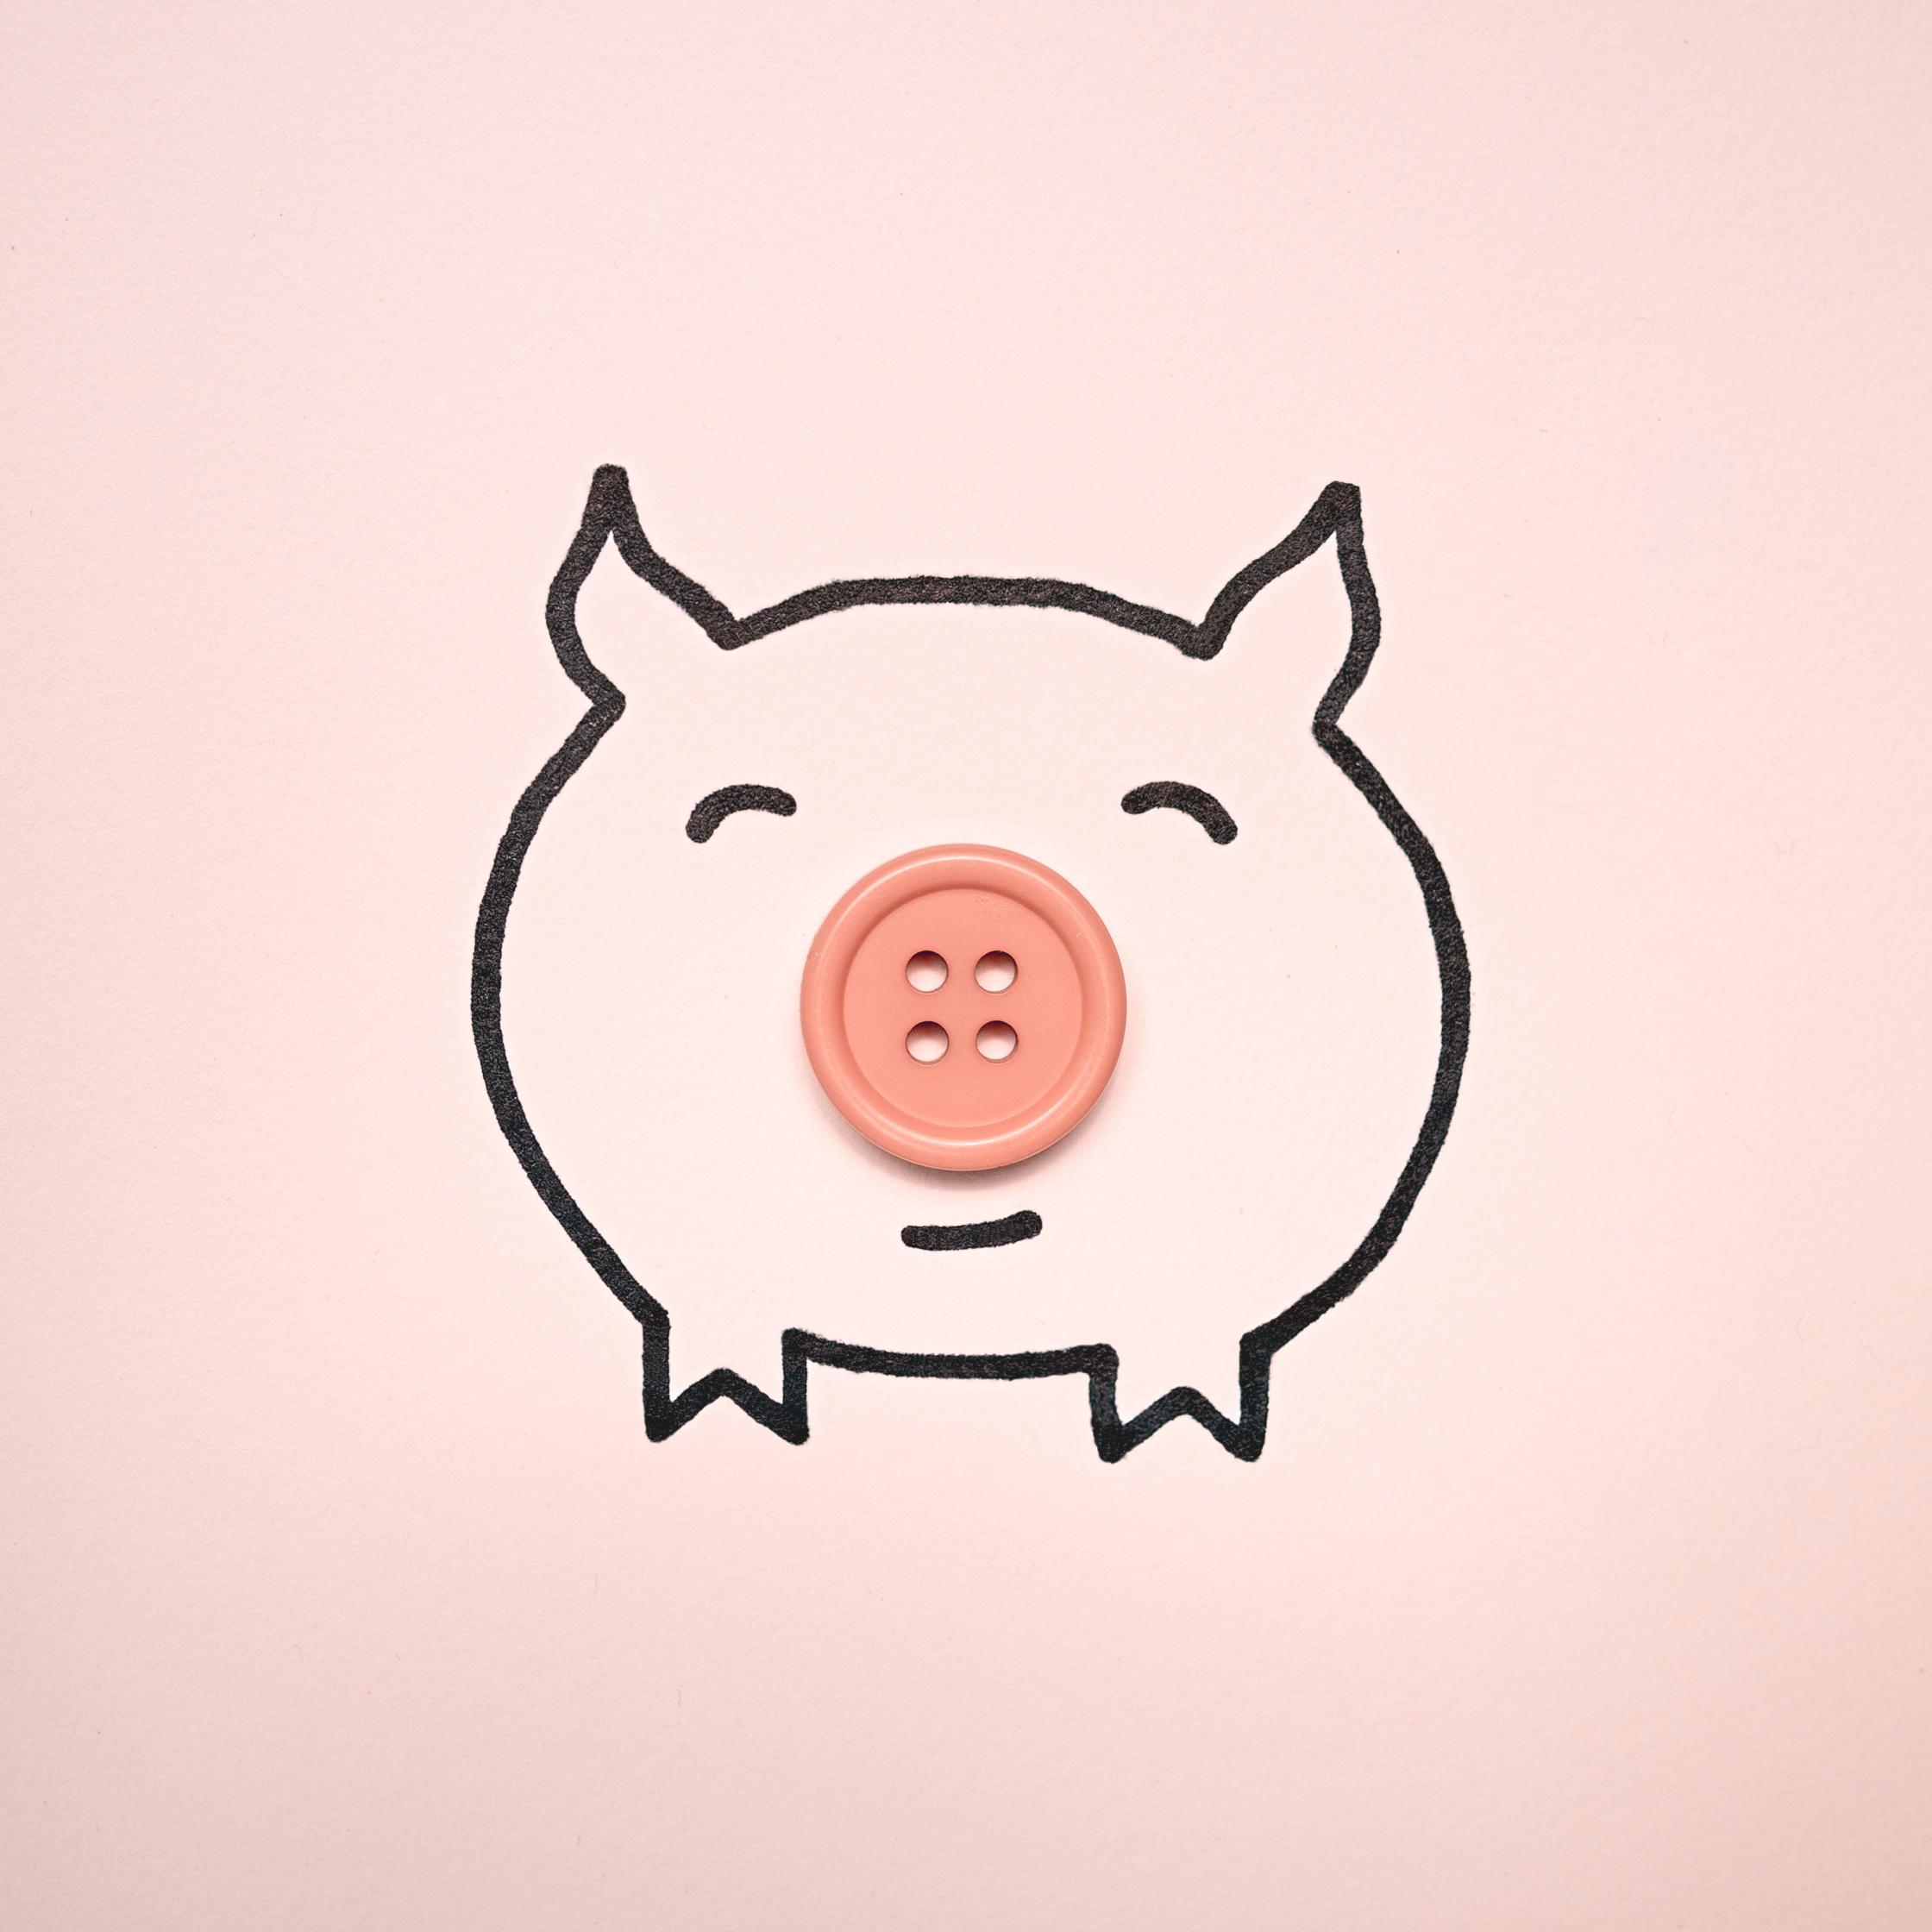 Button_Pig_Domenic_Bahmann.jpg